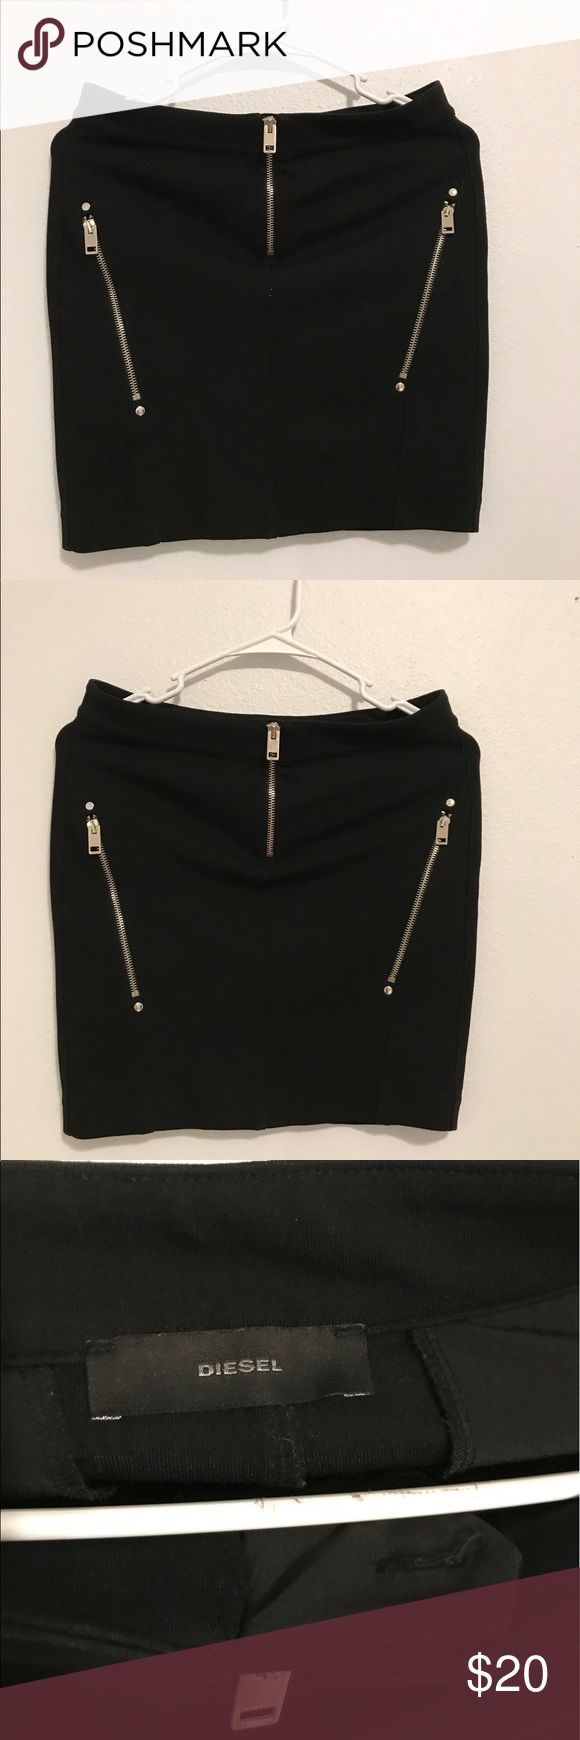 DIESEL black mini skirt Wore twice, in good condition Diesel Skirts Mini